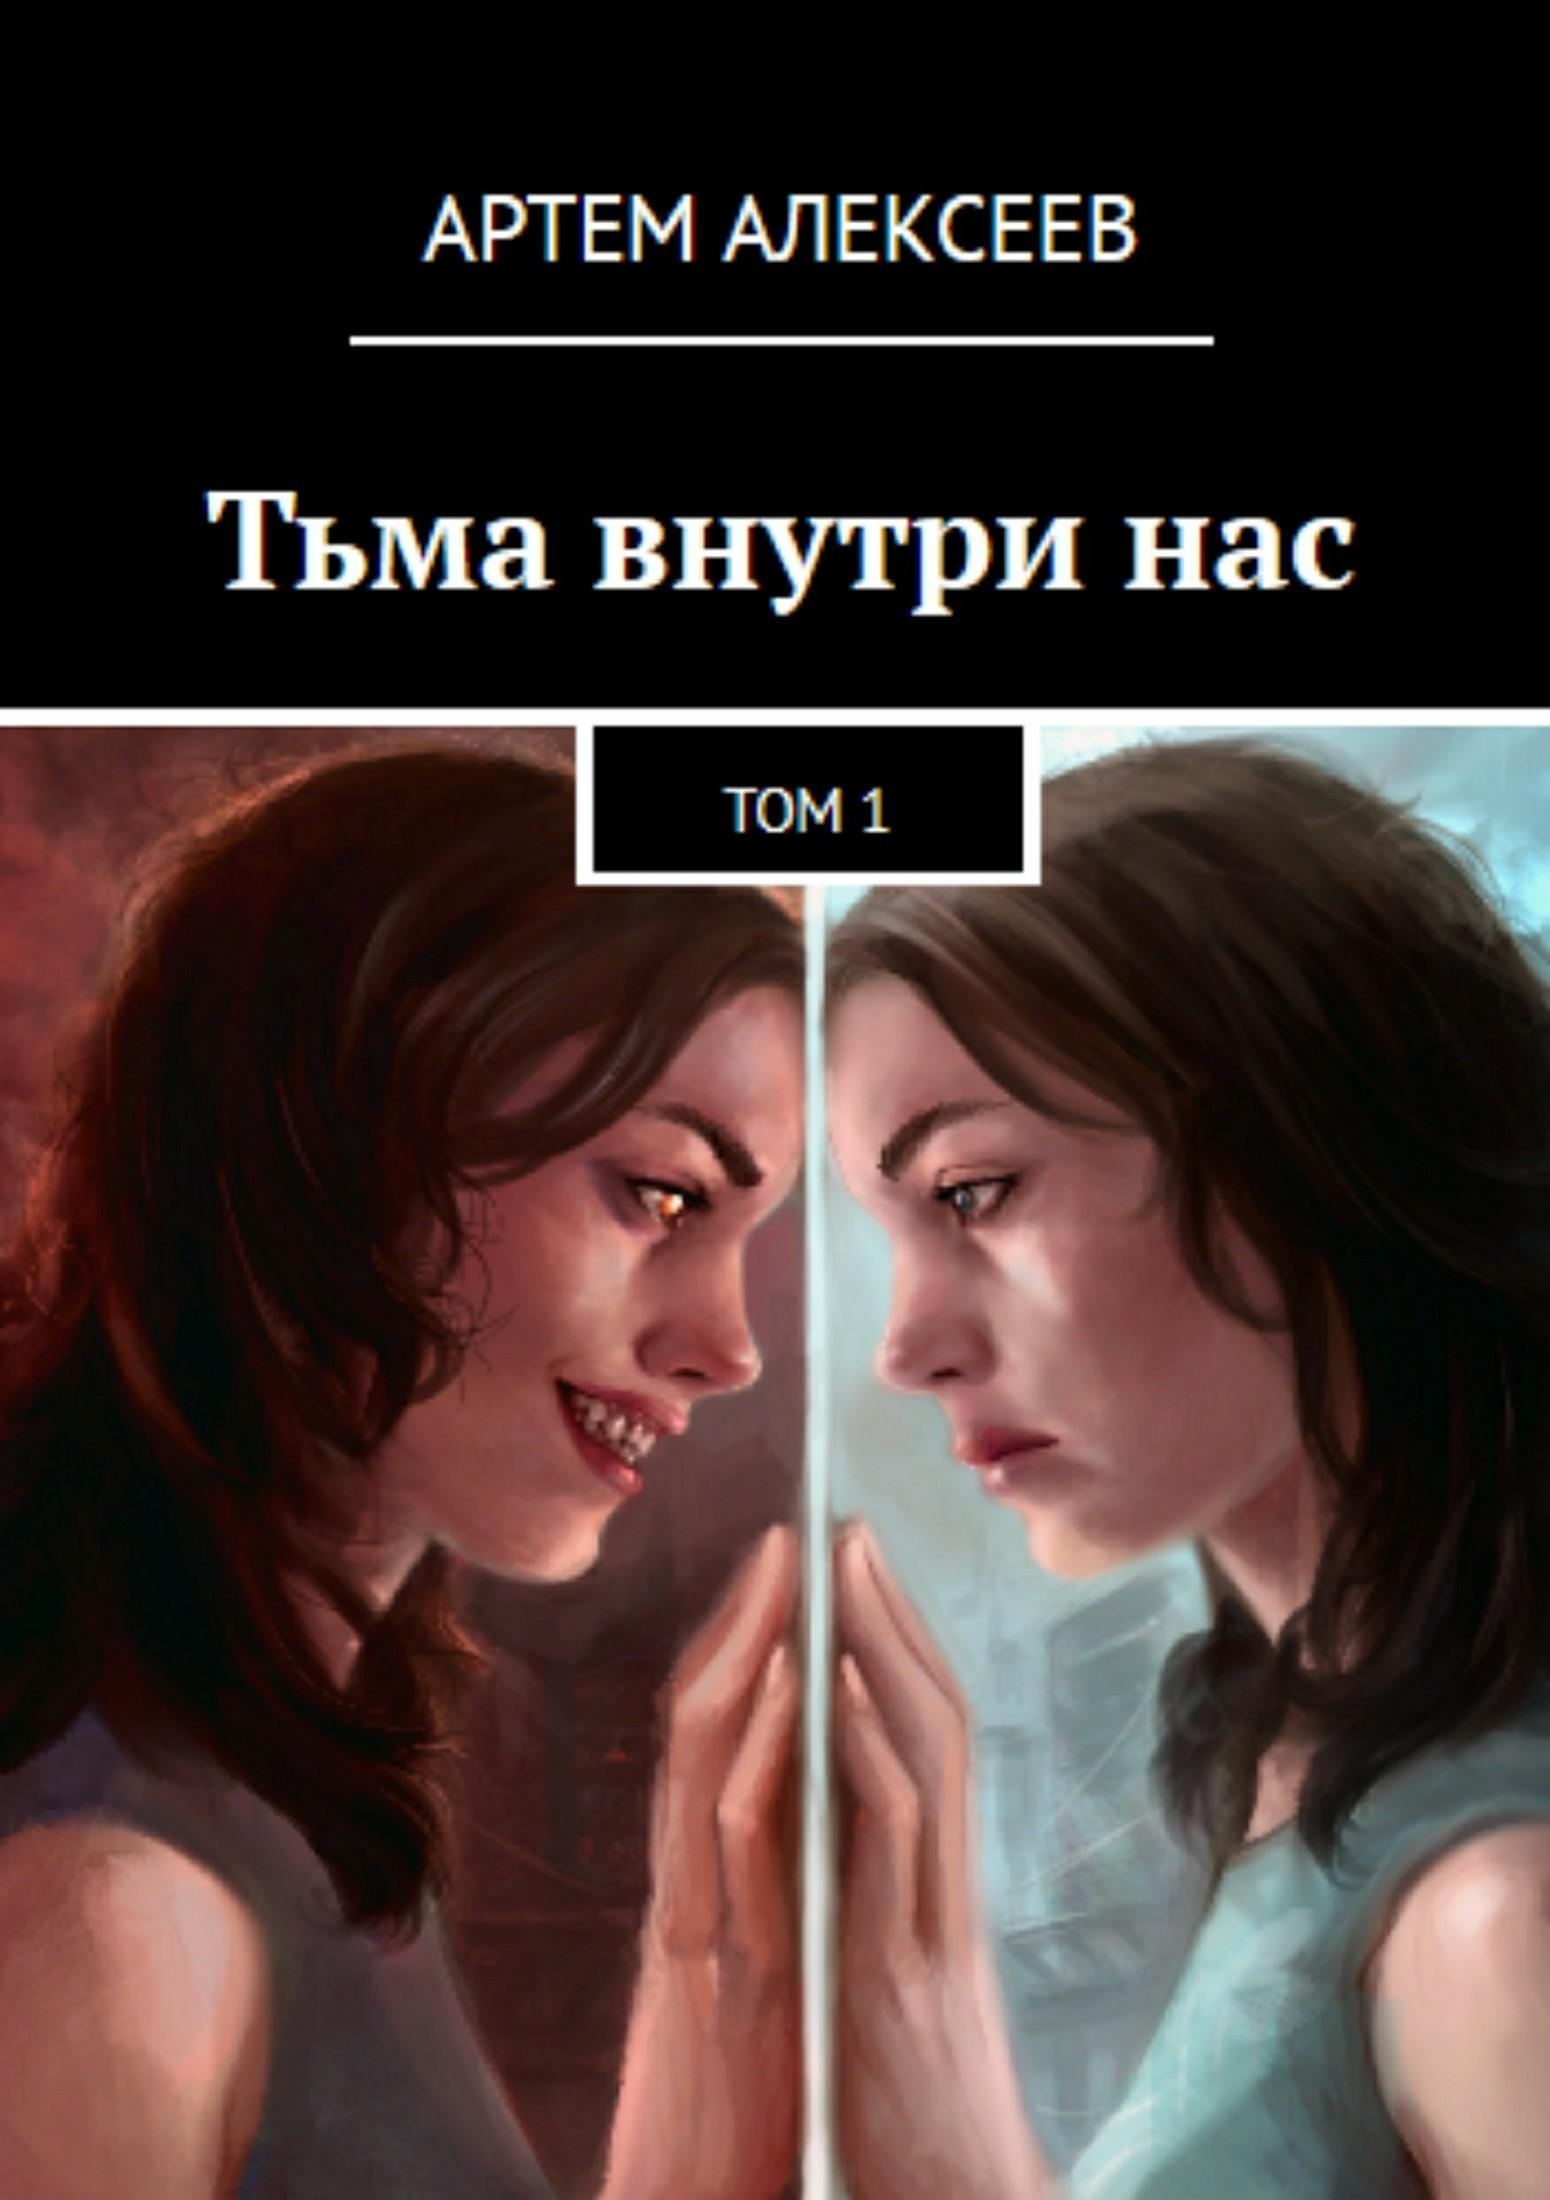 Артем Алексеев бесплатно